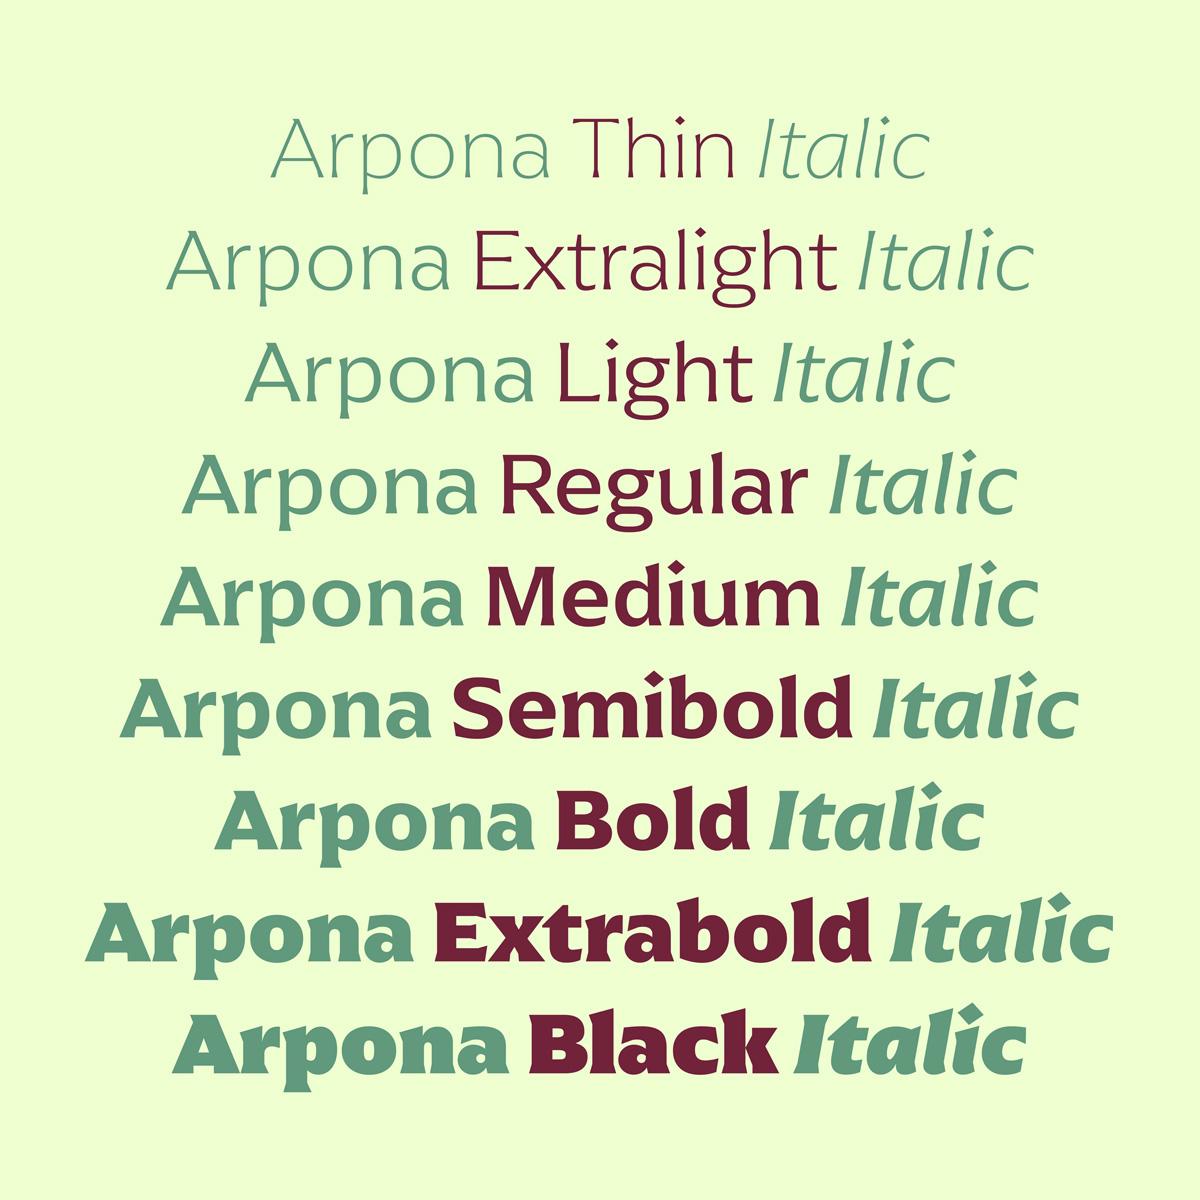 2020-05-06_5eb2be0d74592_07_Arpona_Styles